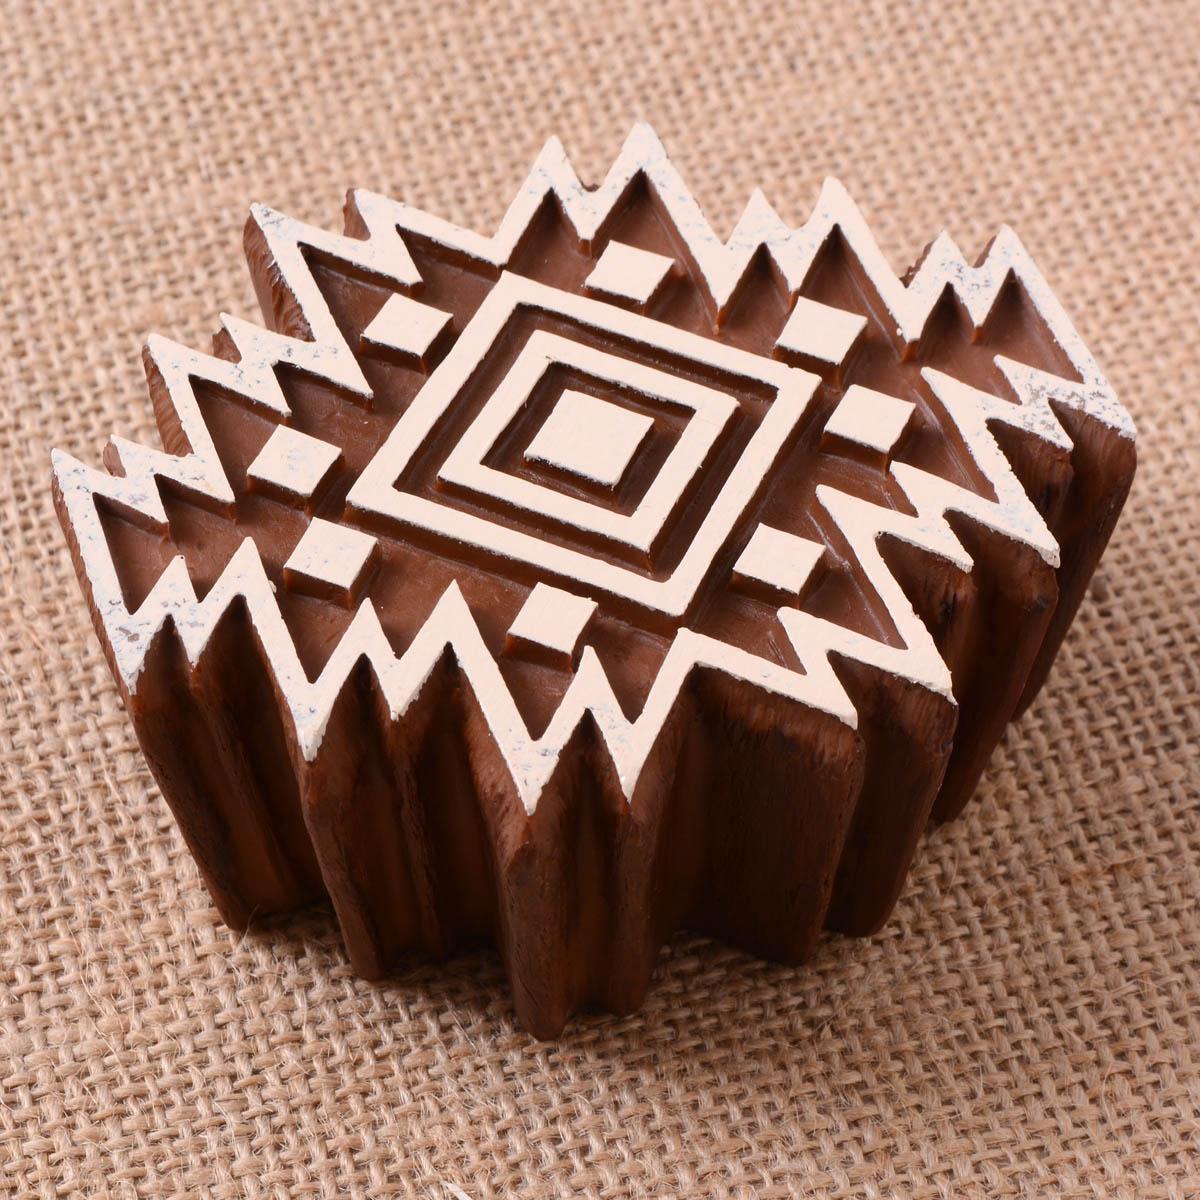 Fabric Creations™ Block Printing Stamps - Medium - Aztec Tile